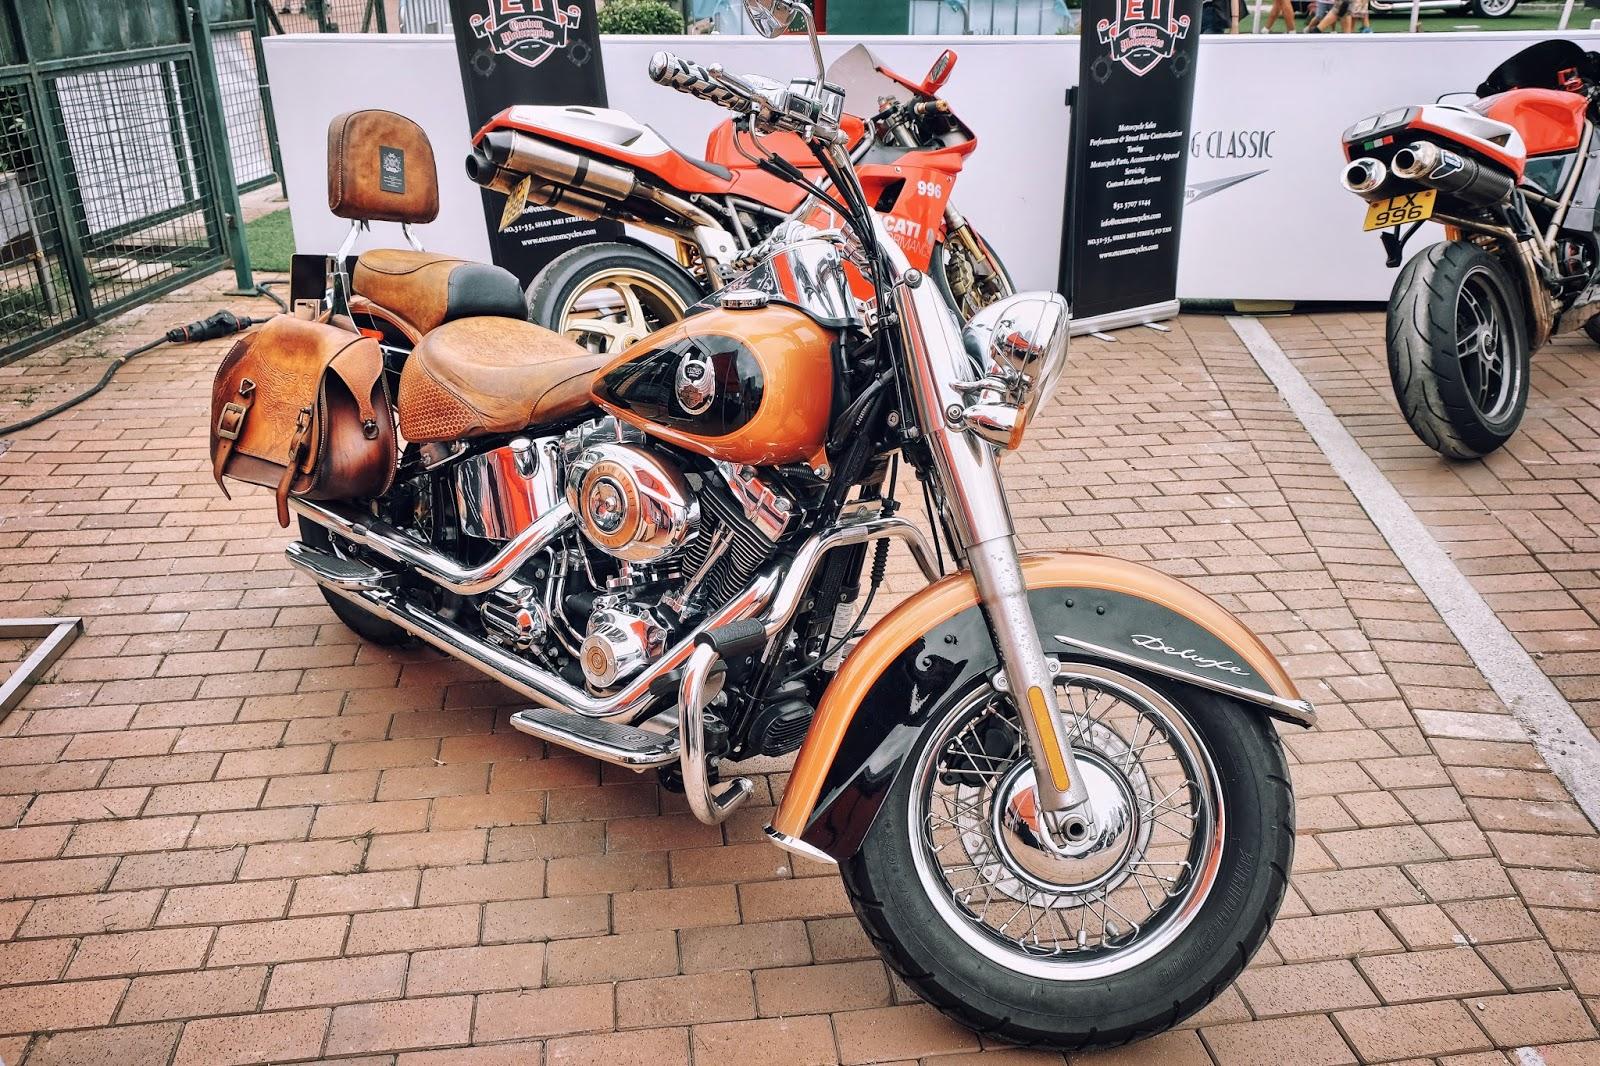 Harley Davidson Softail Deluxe Motorbike